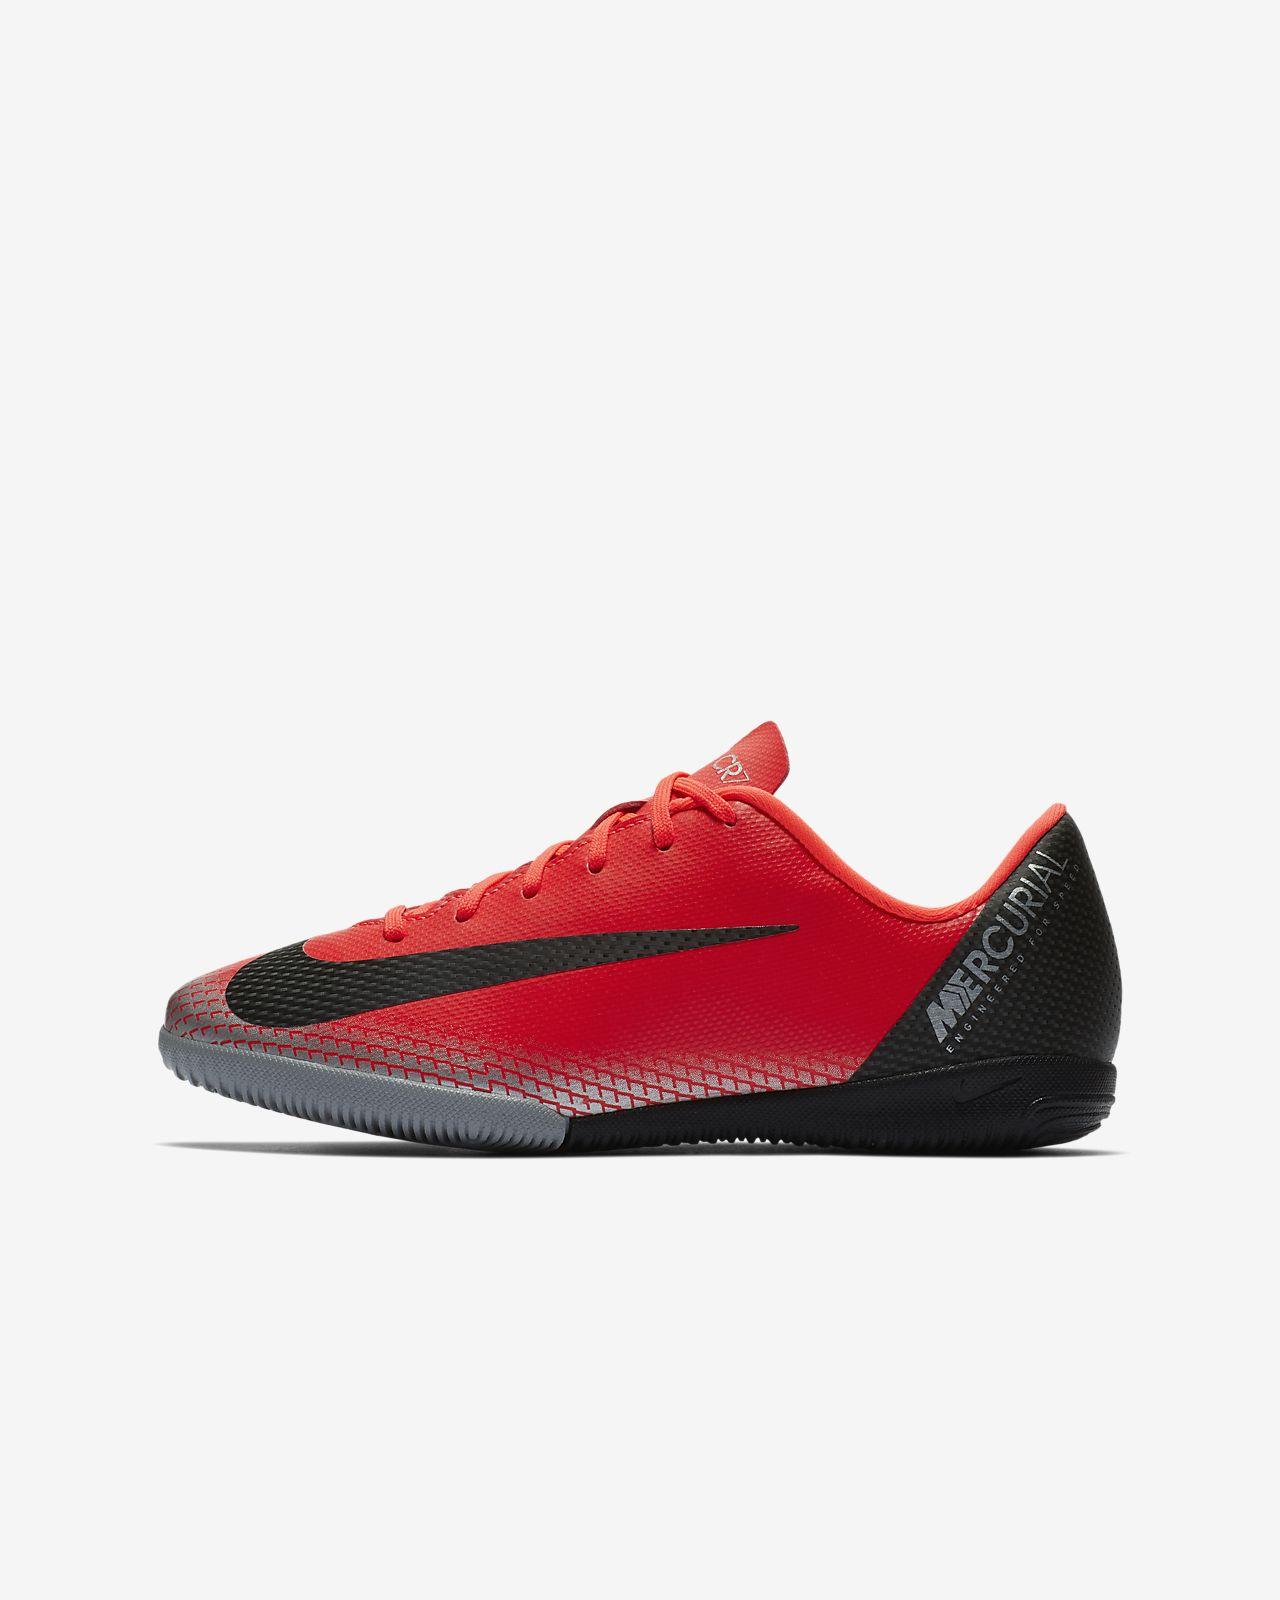 Scarpa da calcio per campi indoor Nike Jr. MercurialX Vapor XII Academy CR7 - Bambini/Ragazzi